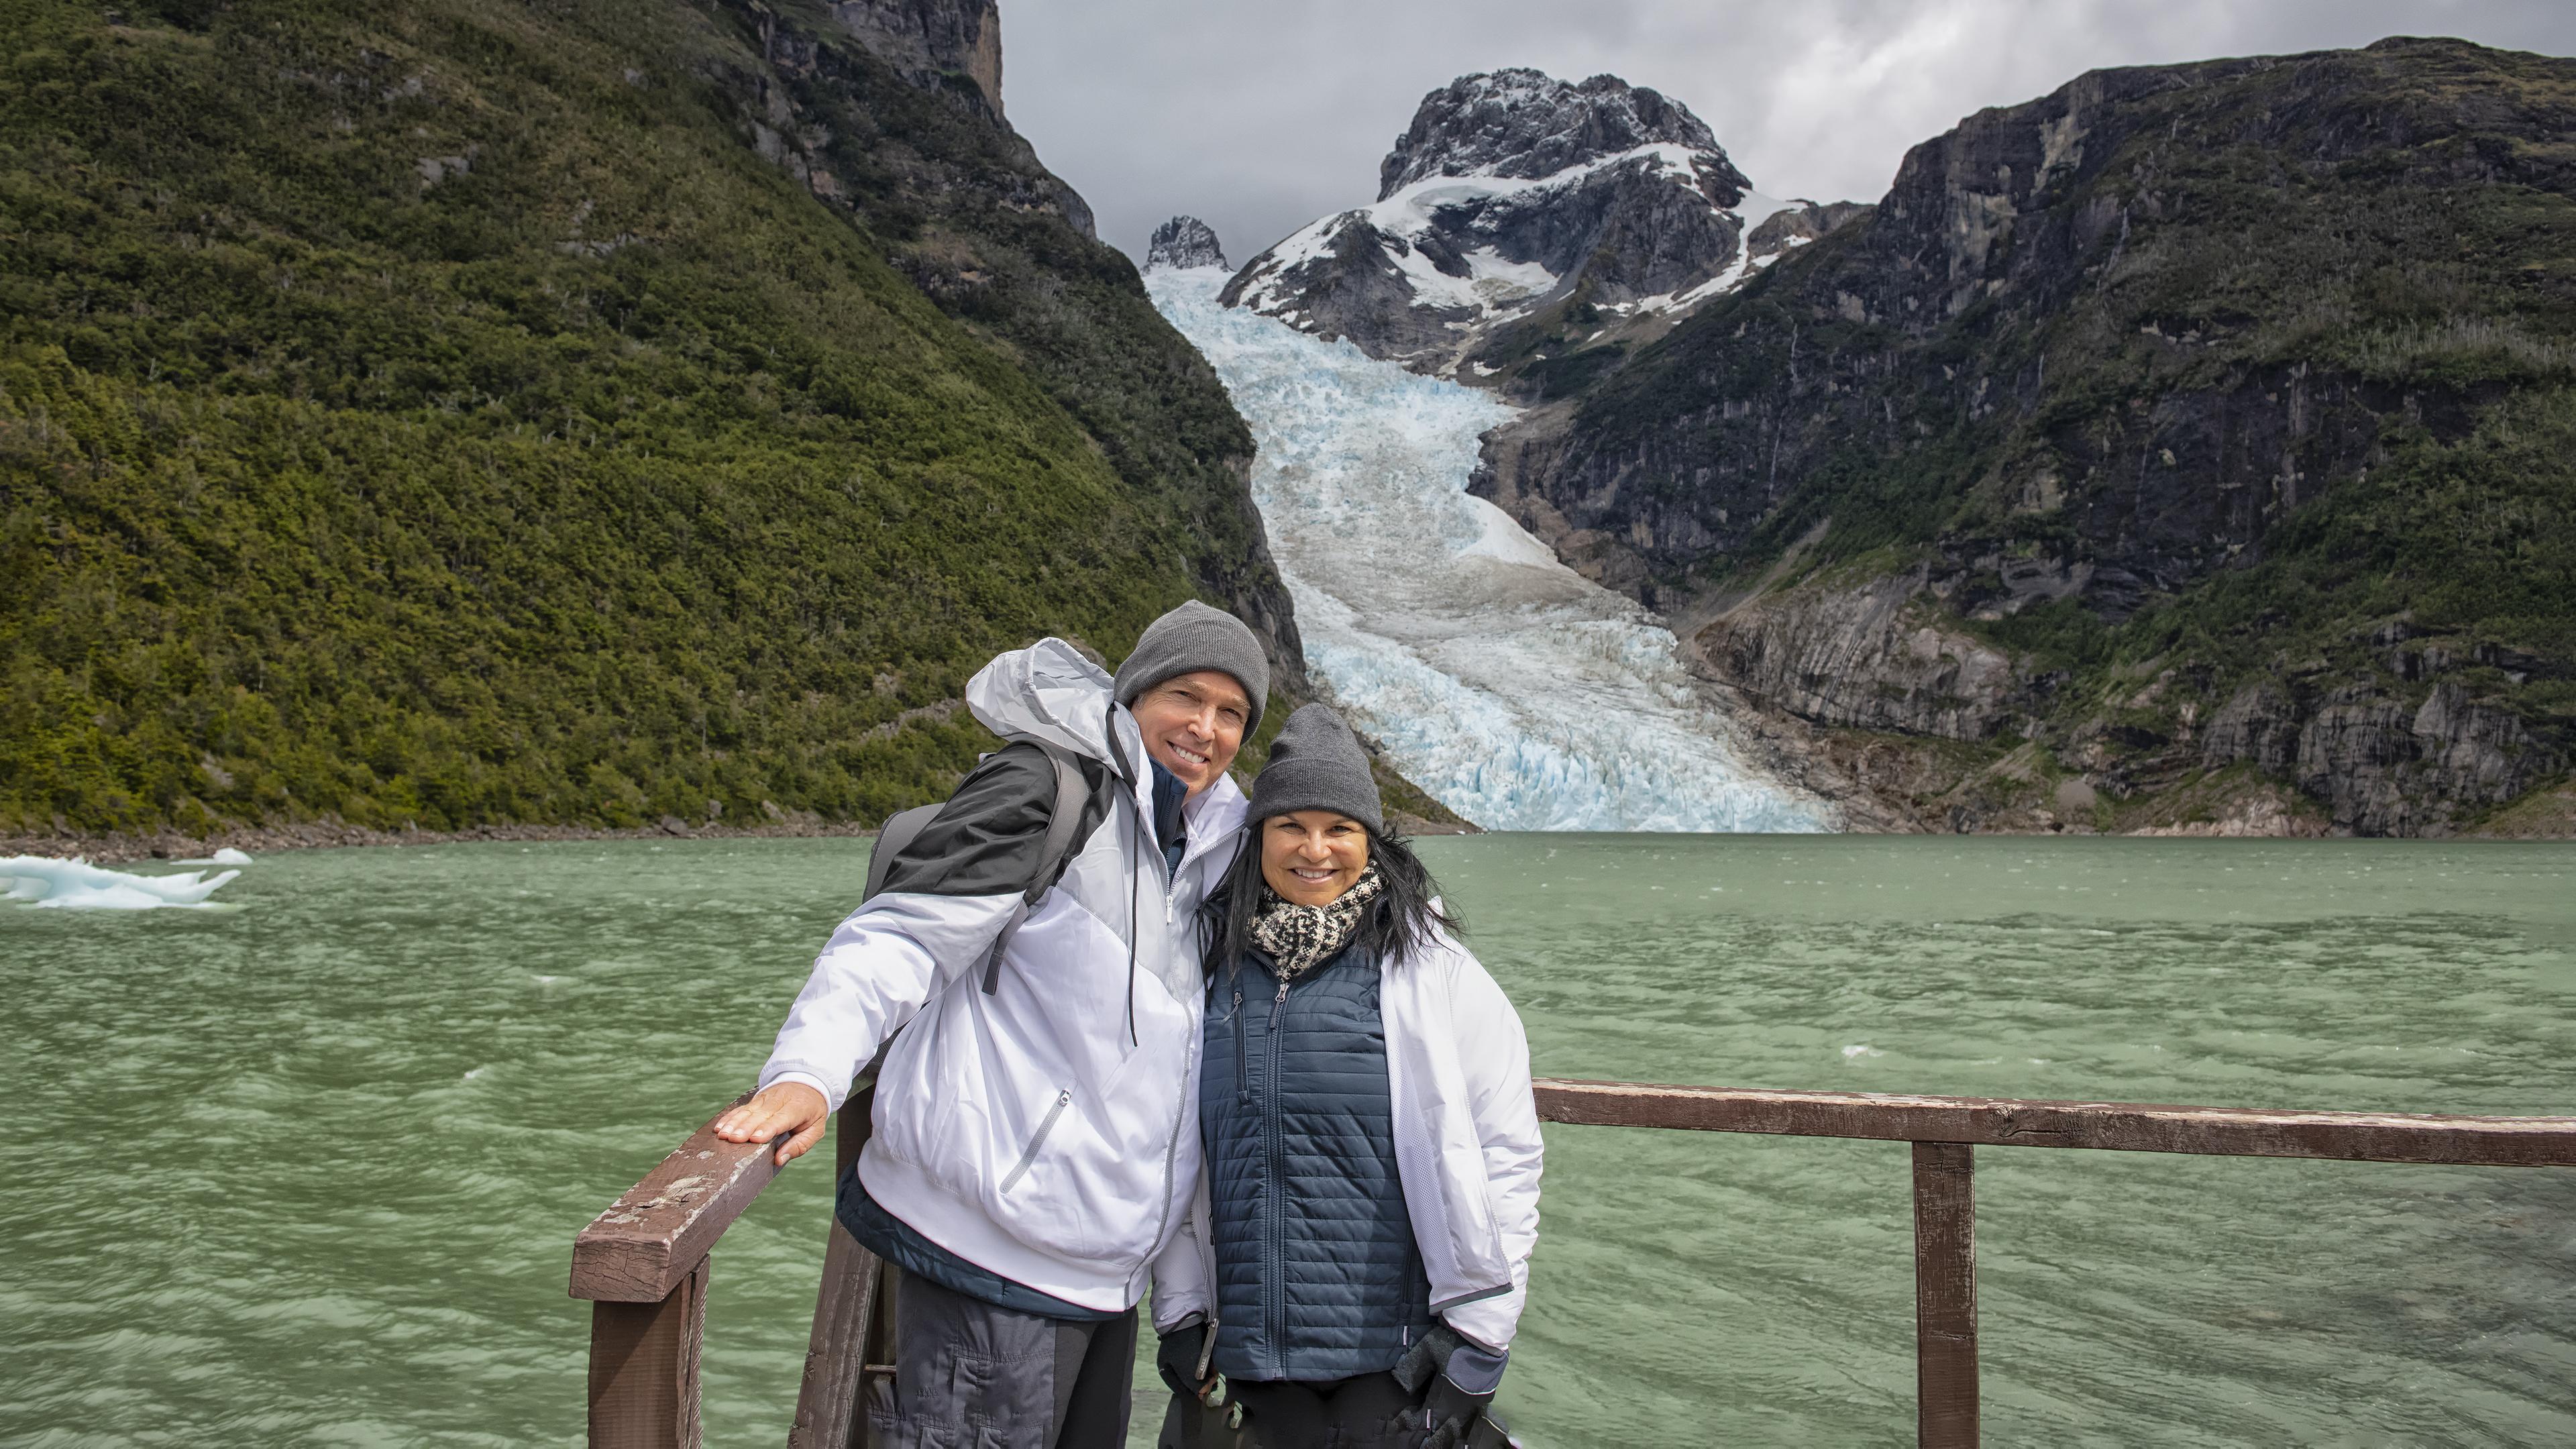 Enjoying Serrano Glacier